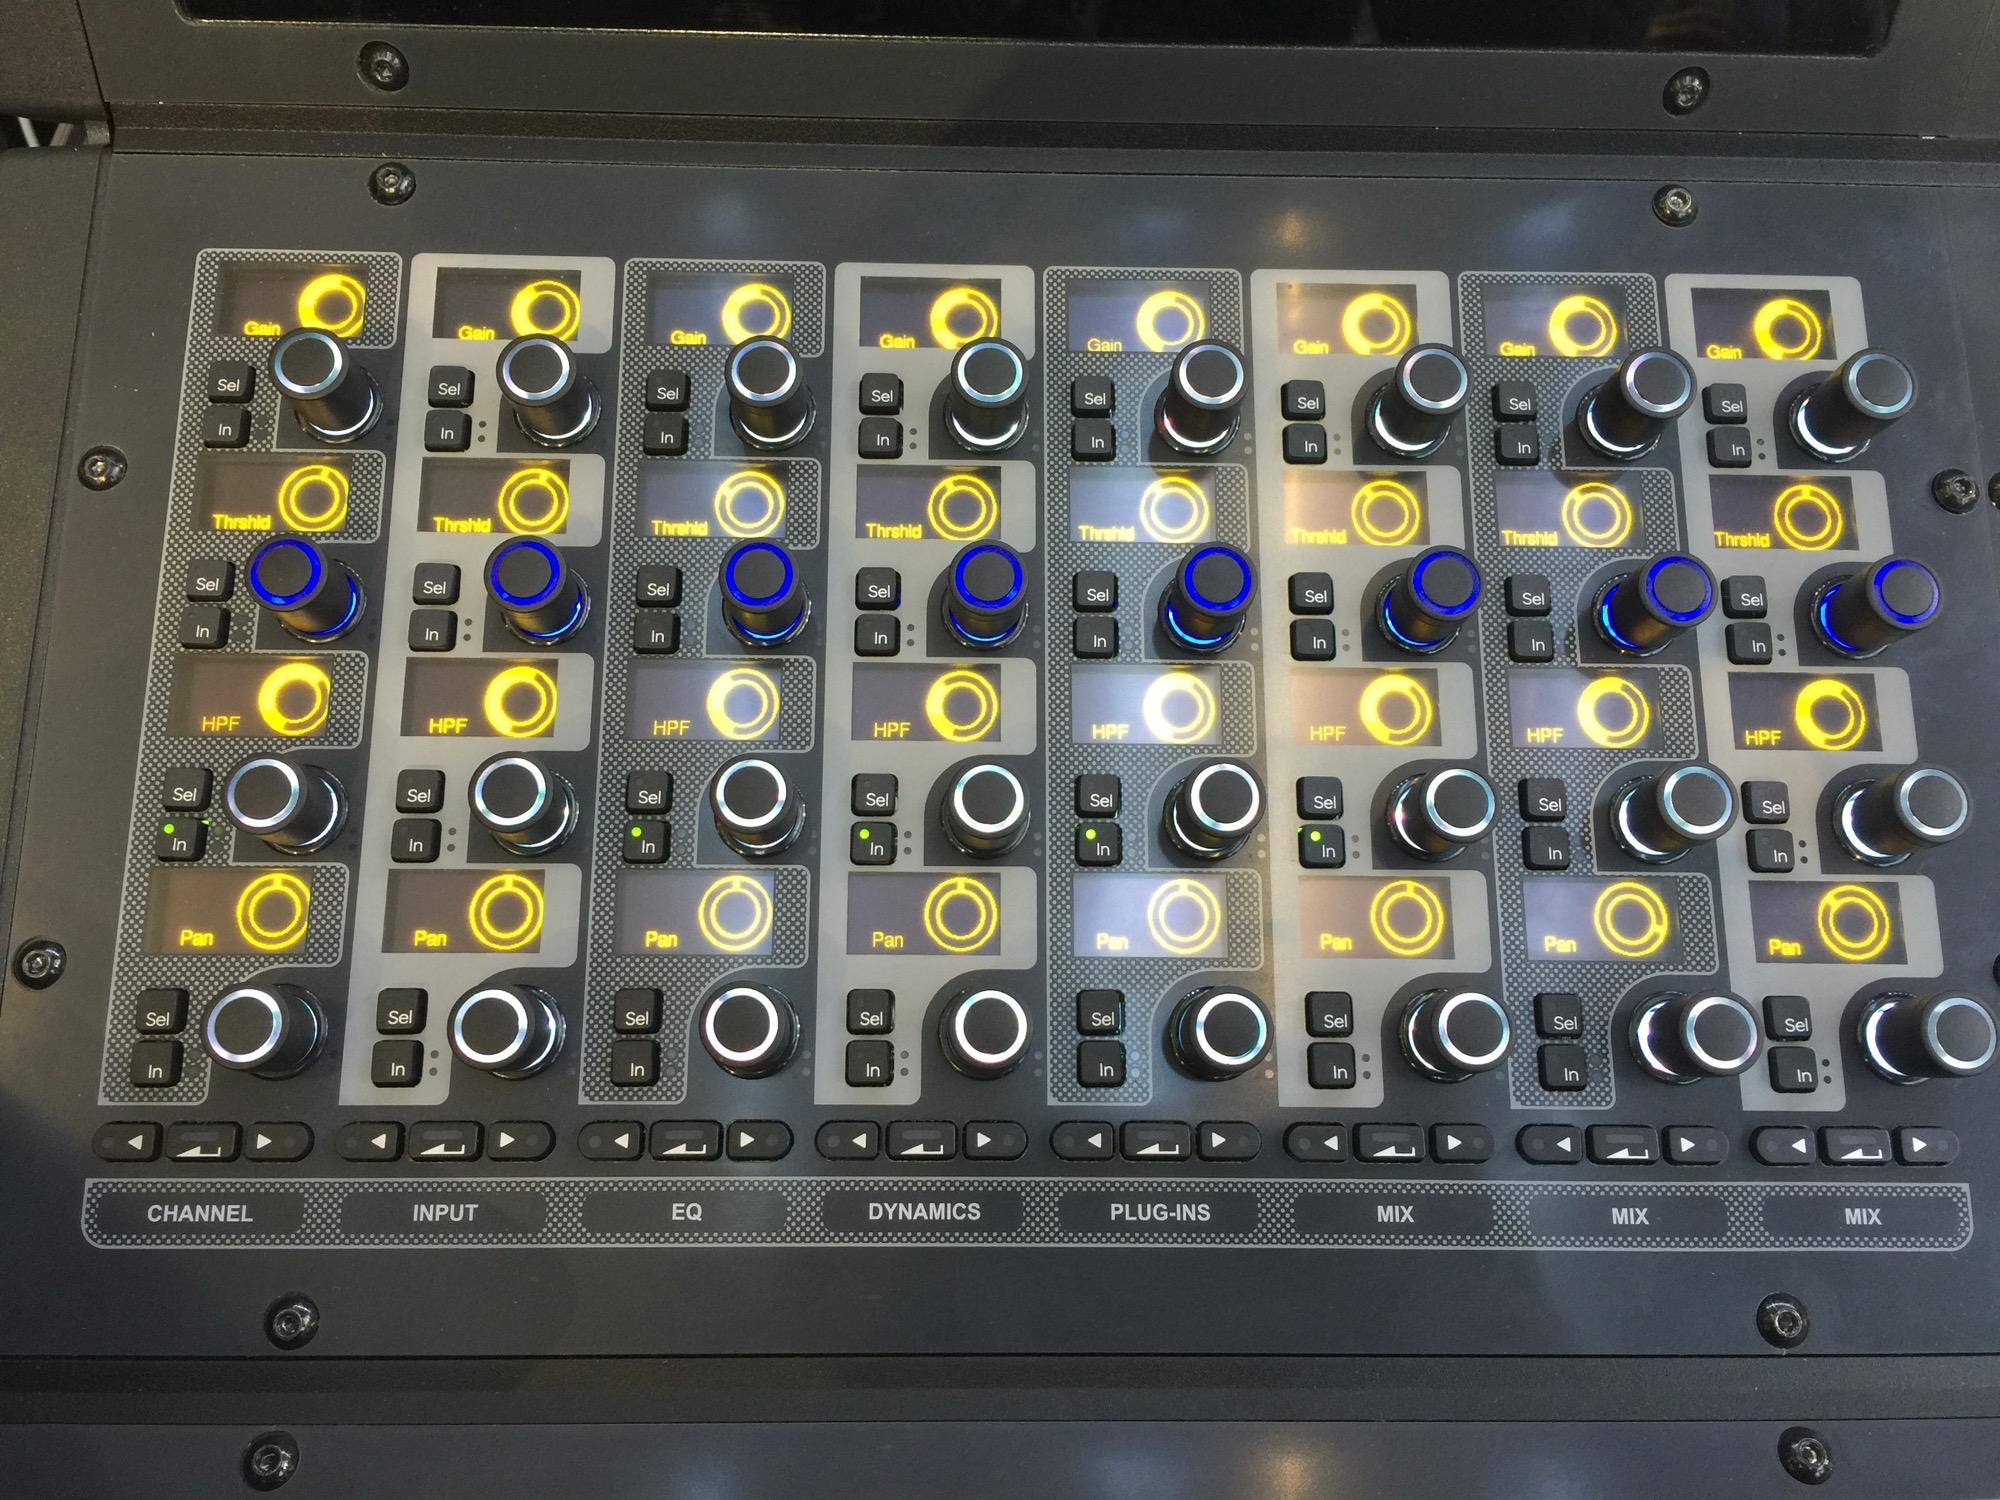 S6L是模块化概念的Venue现场控台,24bit/96kHz的处理能力,与Pro Tools软件和AAX插件无缝连接。 本文为Musikmesse 2015展会现场报道,感谢传新科技公司为midifan提供独家赞助。  每一路推子下面有代表其编组的颜色LED灯,让你在黑暗里也知道谁是谁:  每个旋钮上面都有LED屏幕表示的虚拟旋钮,让你知道当前数值和参数等信息:  三个大触摸屏幕可分别显示不同内容,比如通道条:  全部输入通道的全局预览:  你还可以外接额外的显示器显示更多内容:  主控模块:  接口箱